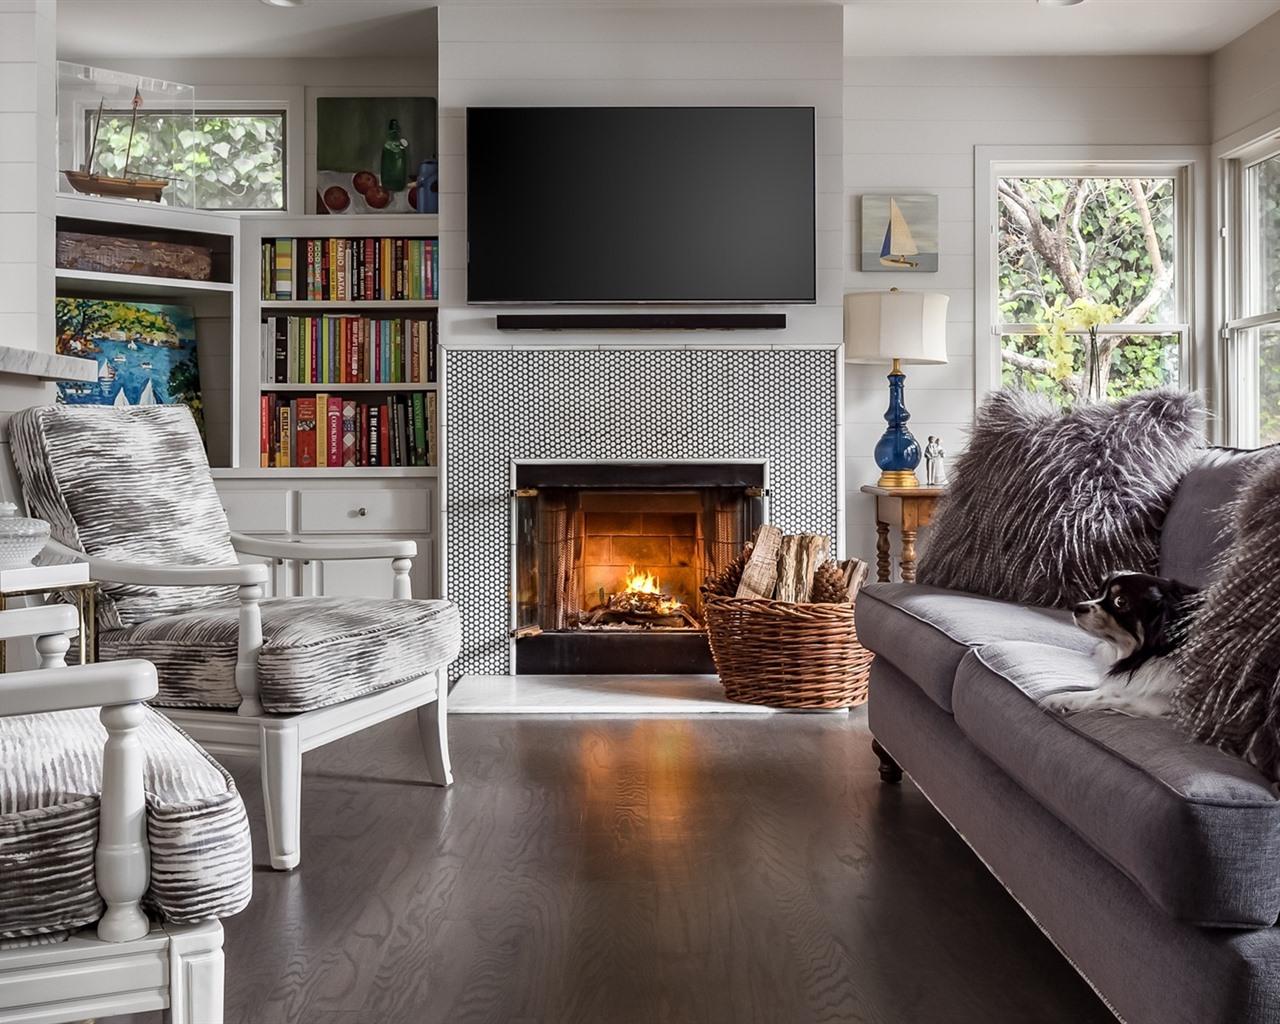 Wallpaper Living room, sofa, chairs, dog, fireplace